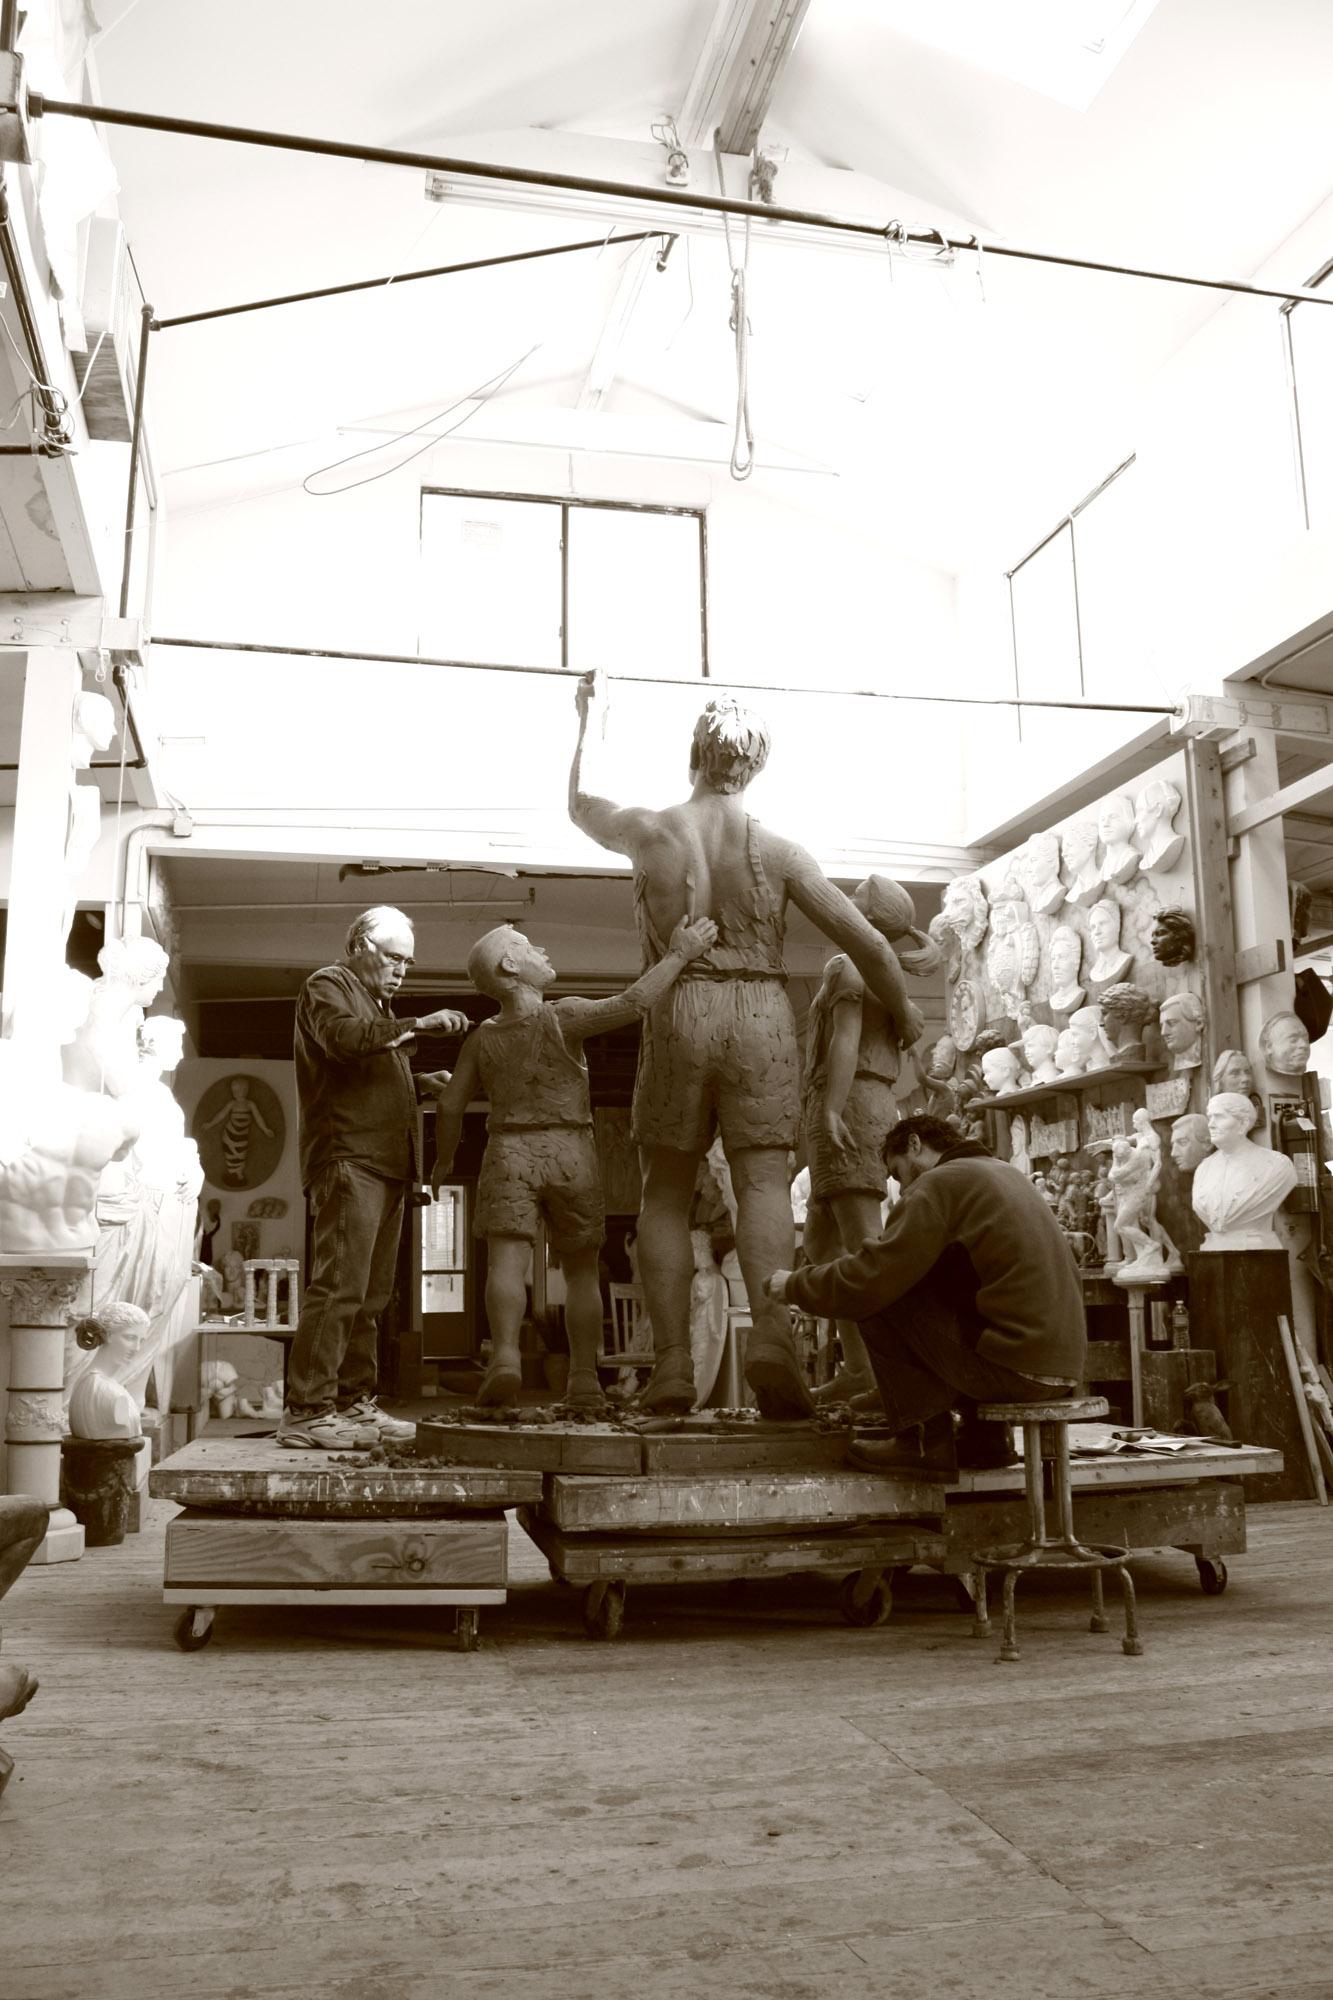 robert shure sculptor president skylight studios inc